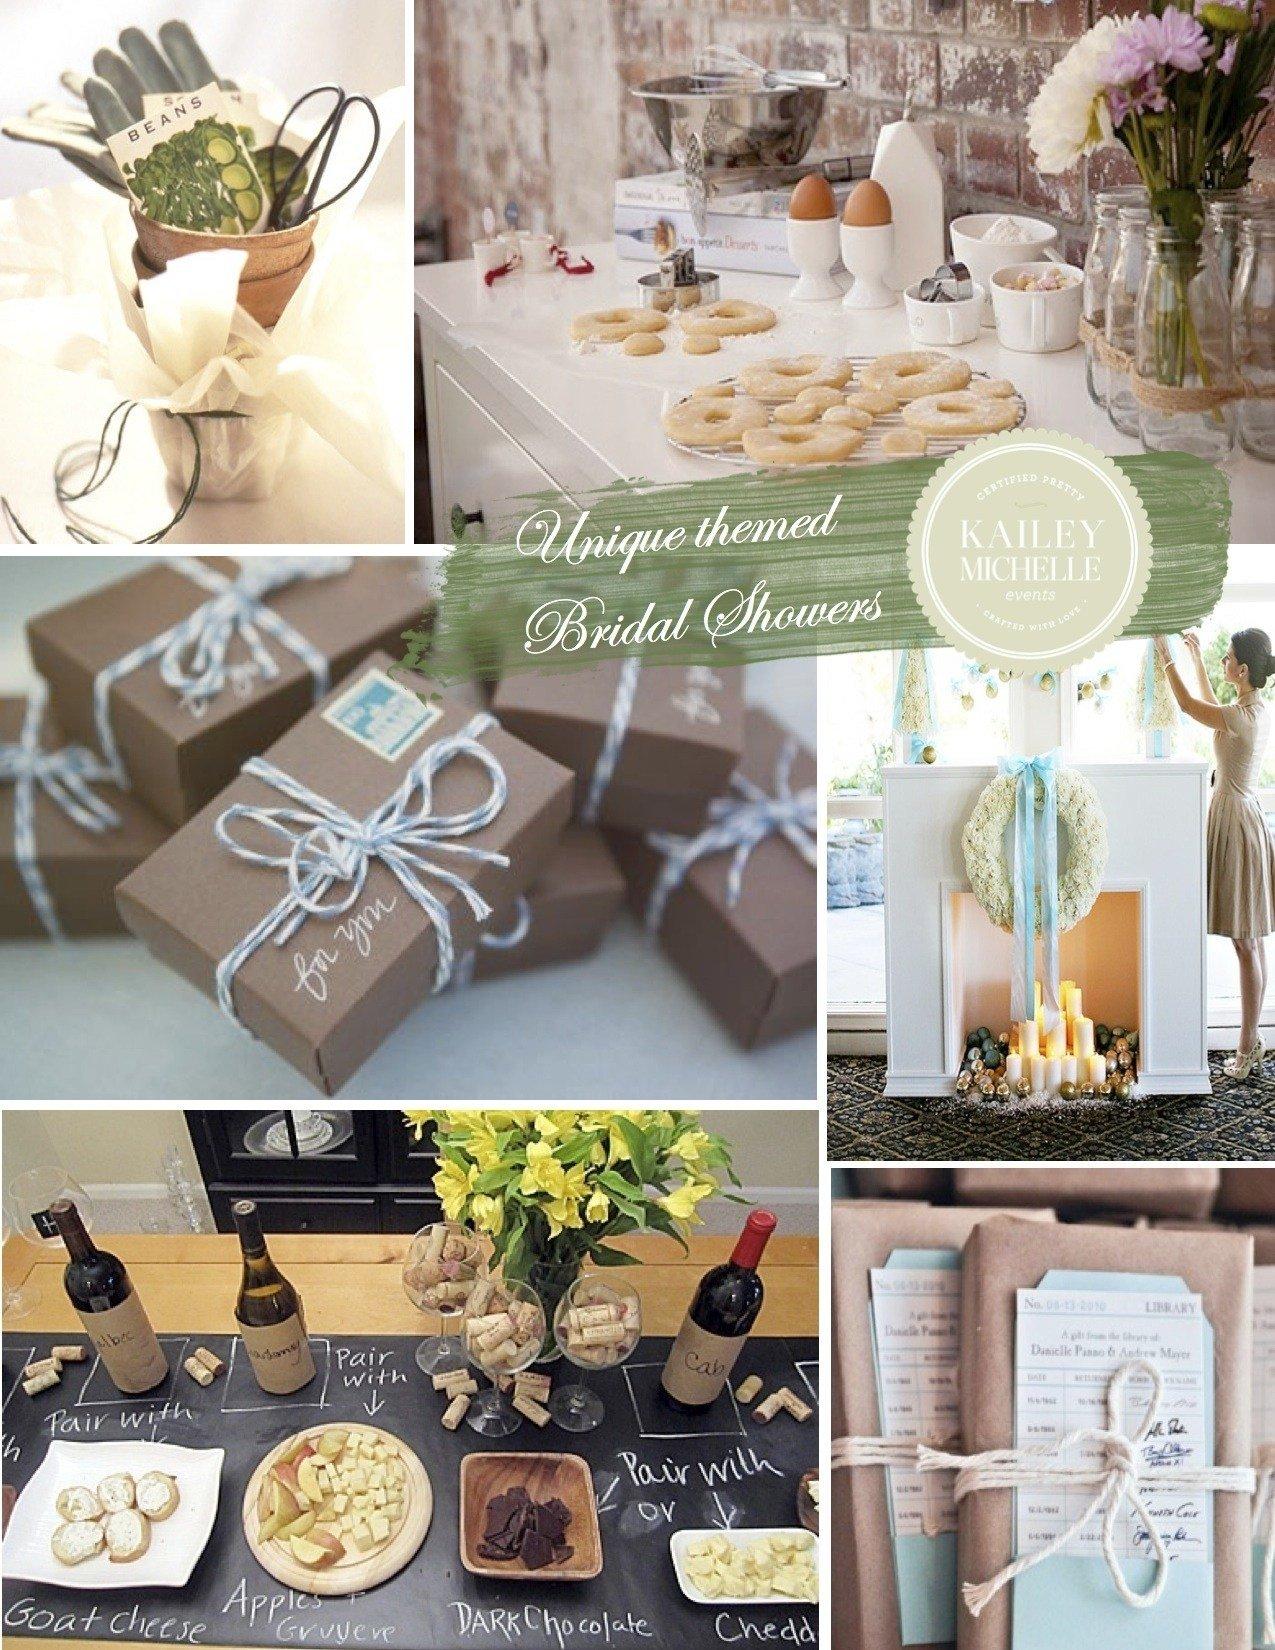 10 Best Martha Stewart Bridal Shower Ideas bridal shower ideas 6 unique themes 4 2020